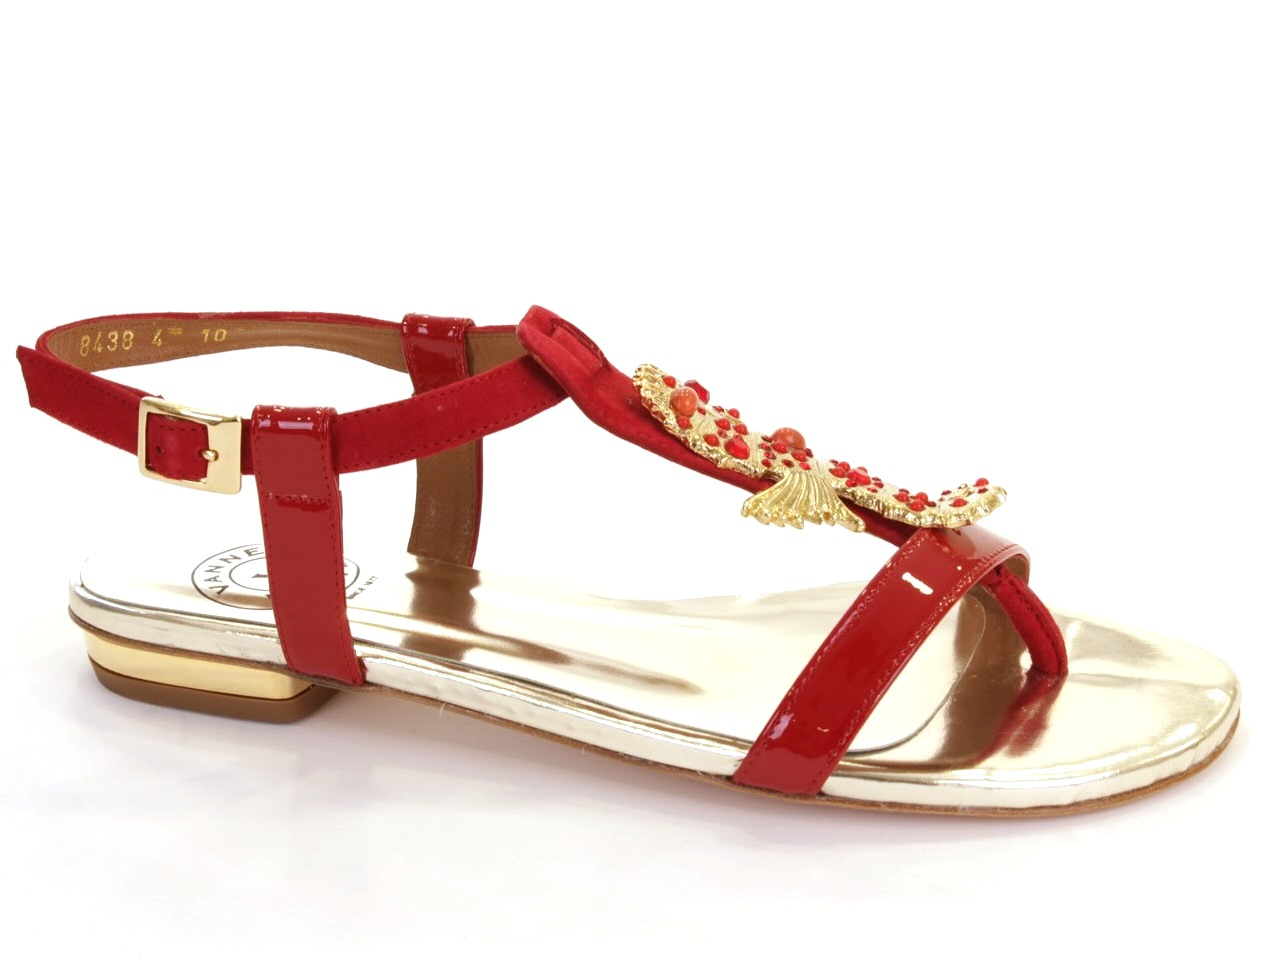 Sandales Plates Vannel - 001 8438